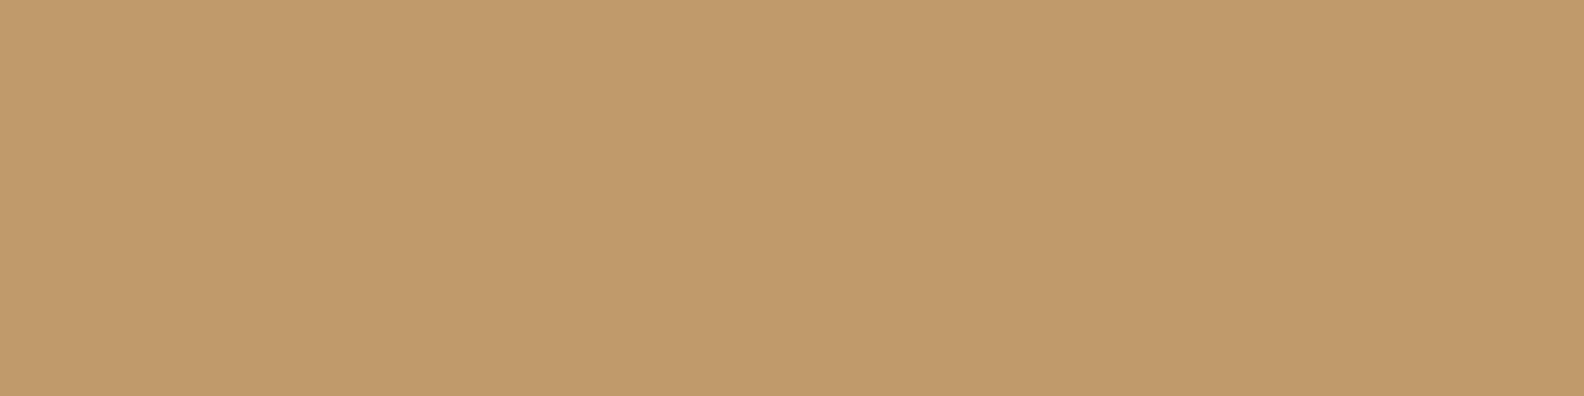 1584x396 Lion Solid Color Background